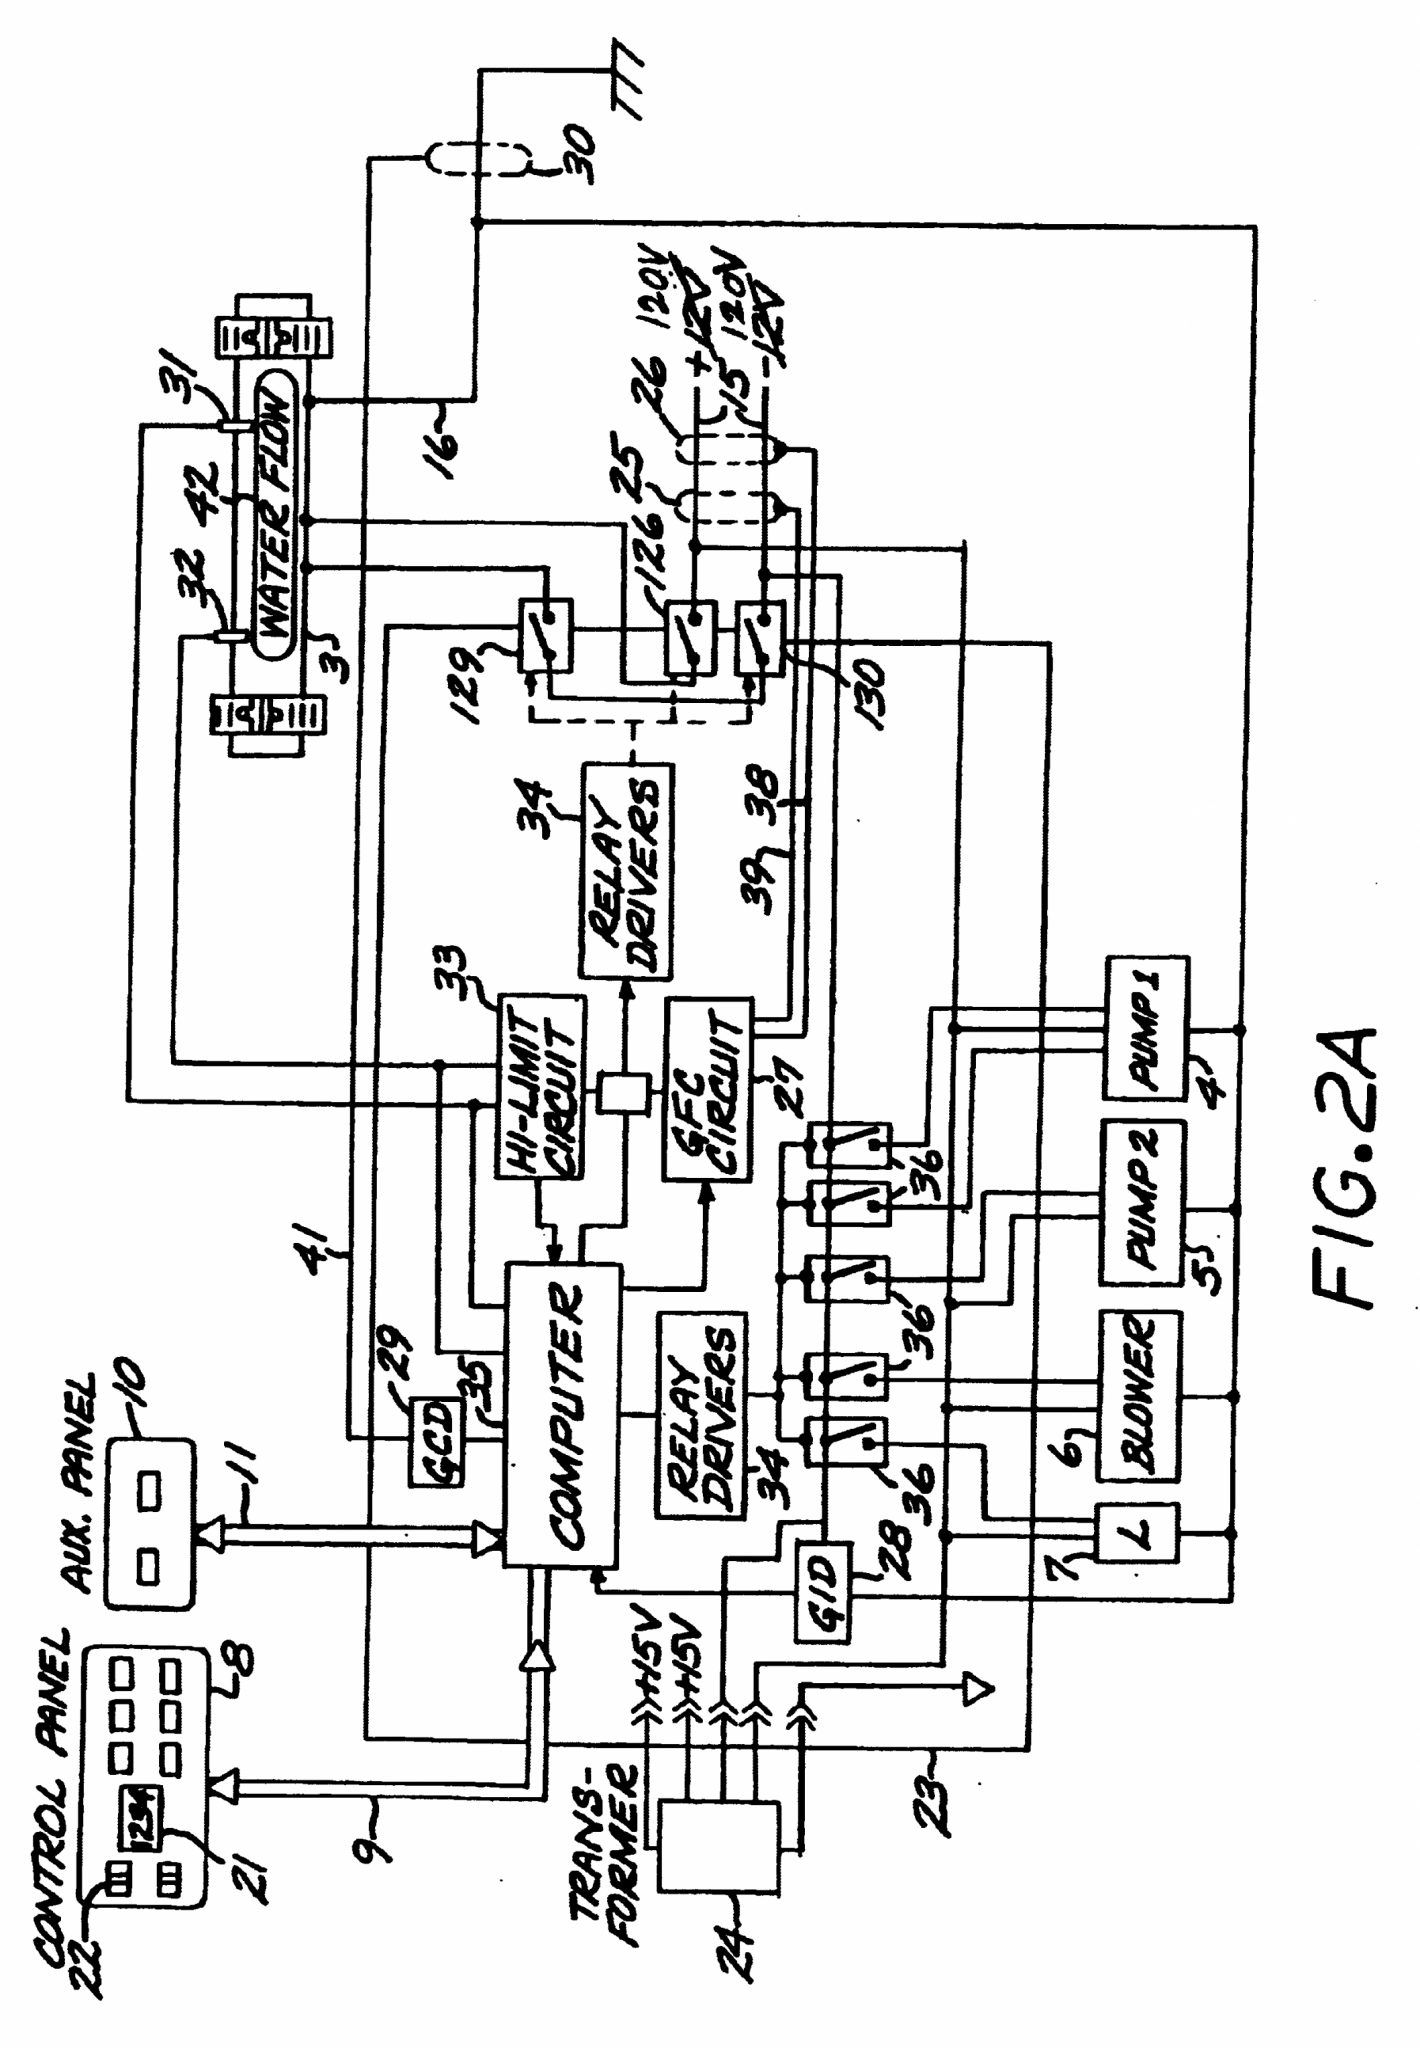 square d well pump pressure switch wiring diagram rh pinterest cl duplex pump control panel wiring diagram start stop station wiring diagram [ 1420 x 2048 Pixel ]